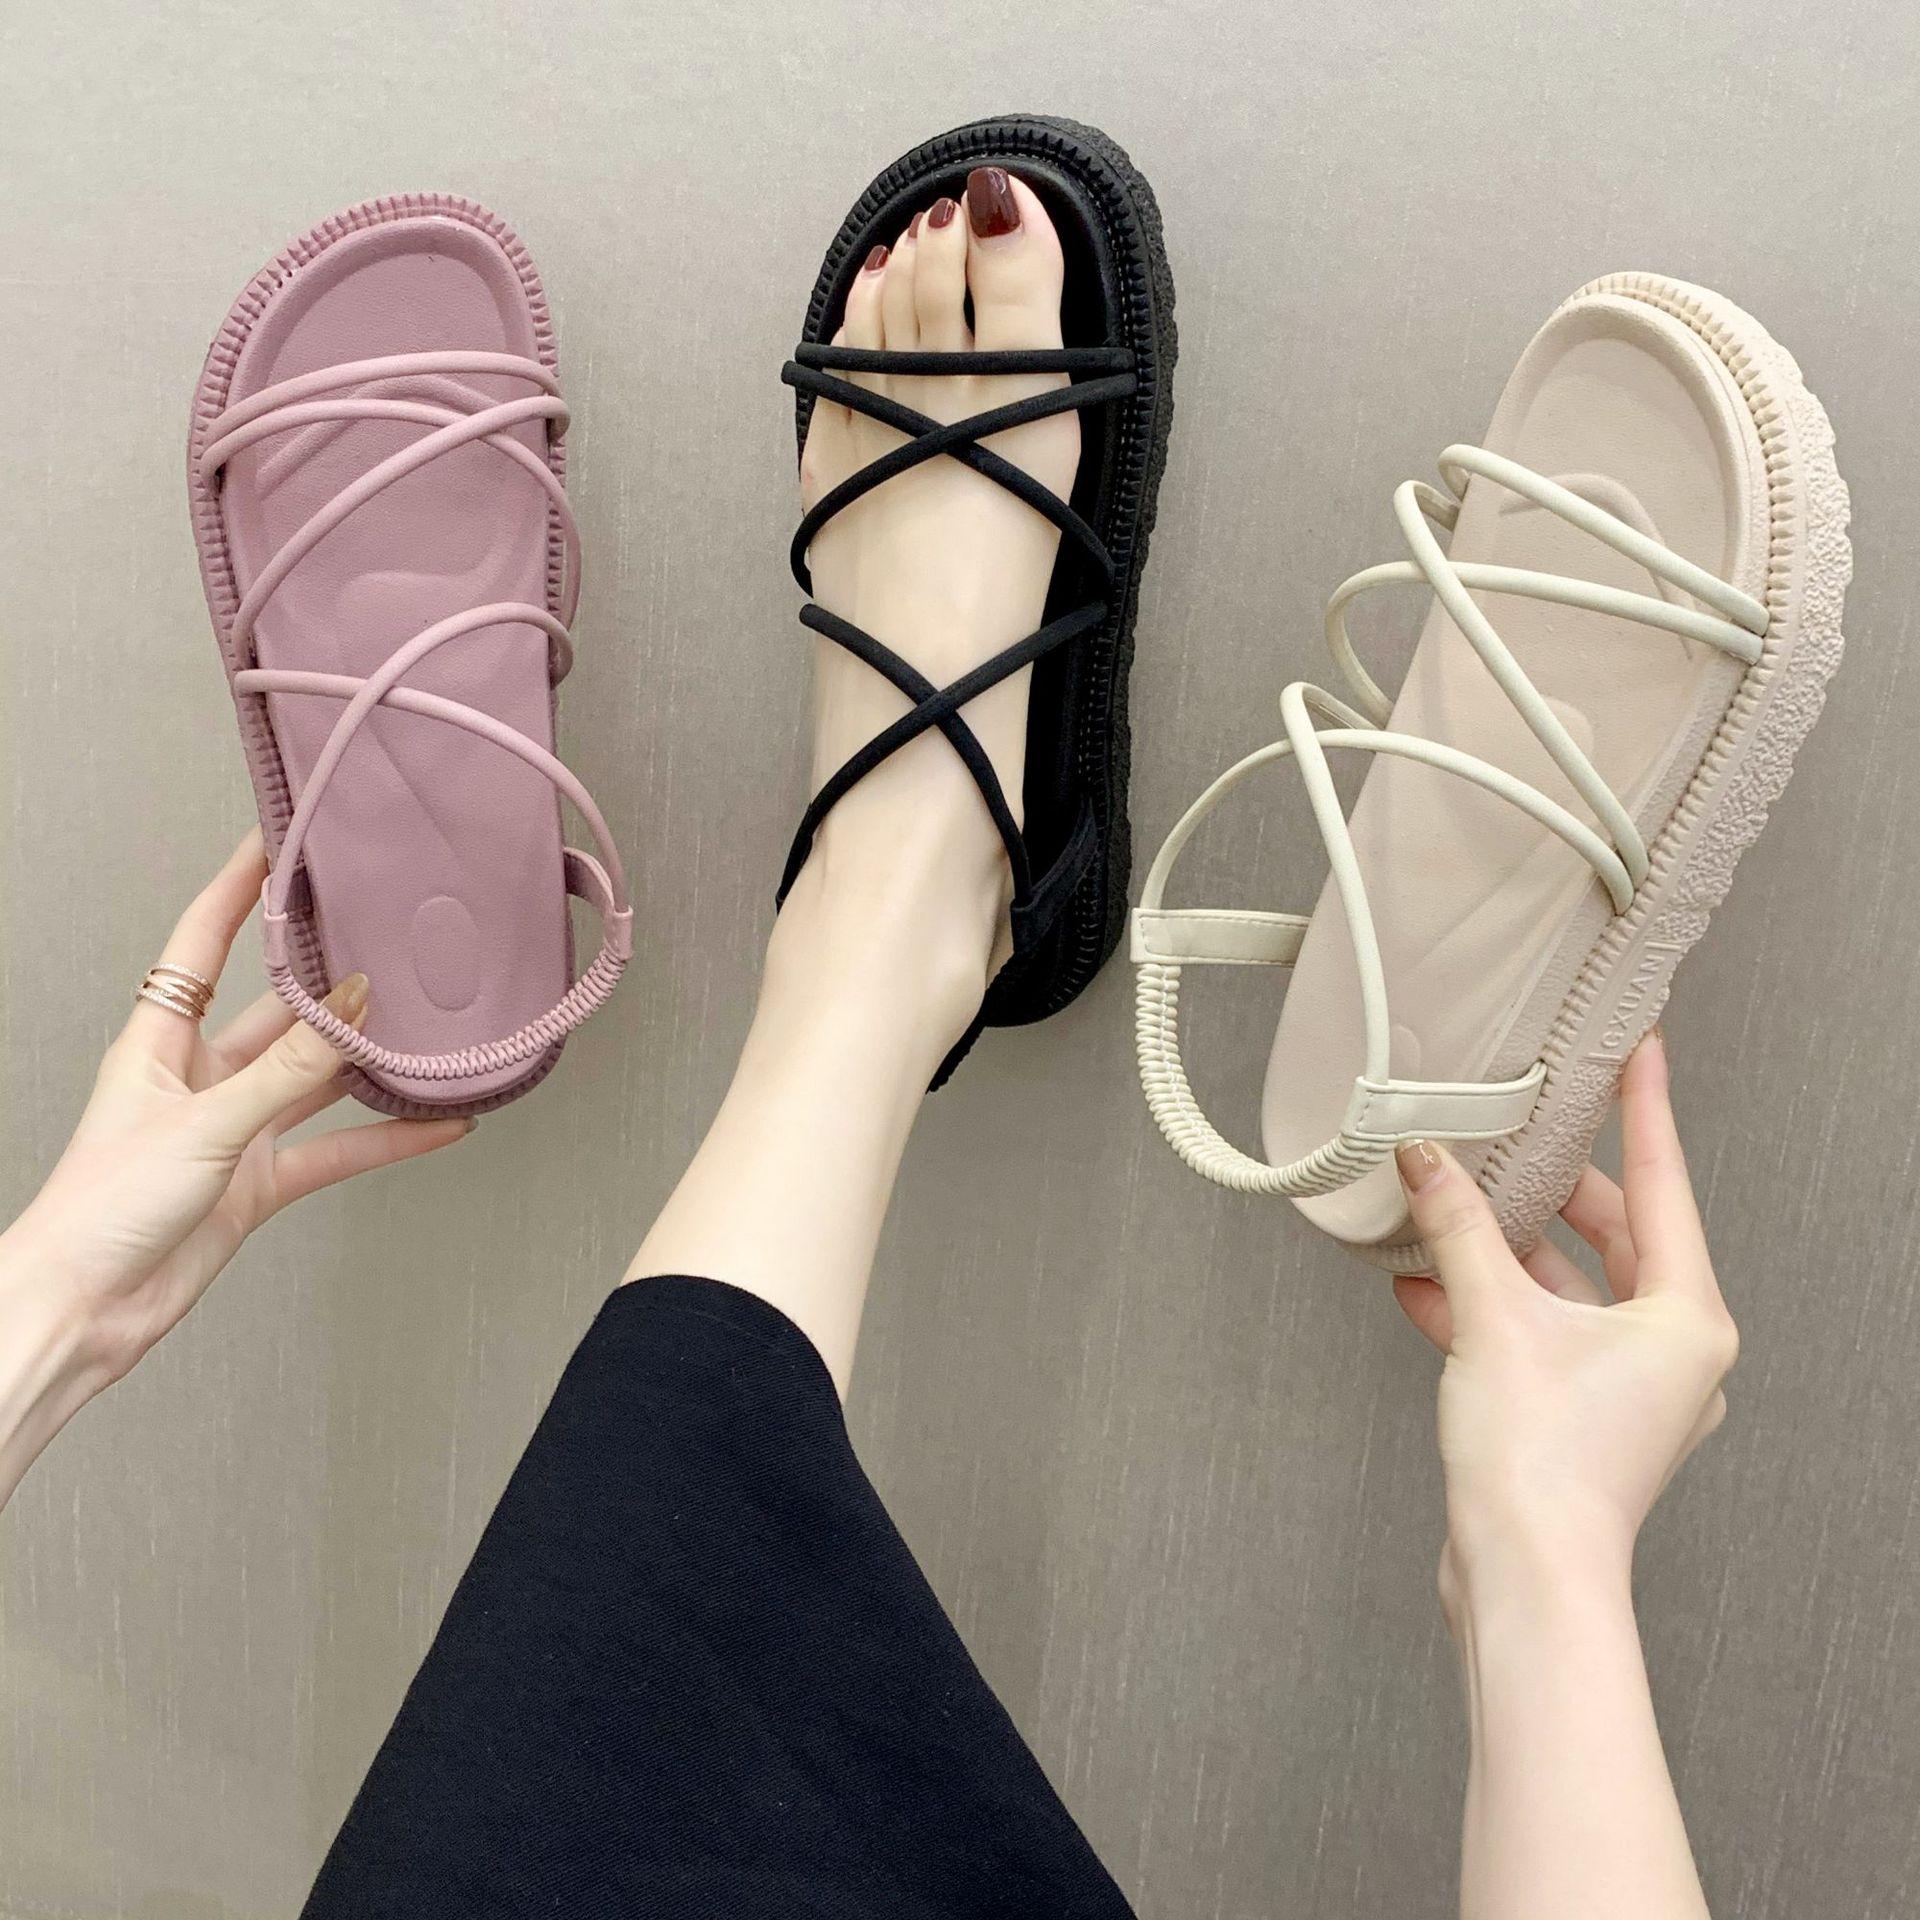 Sandals Female Students Simple Wild New Soft Female Platform Muffin Sandals